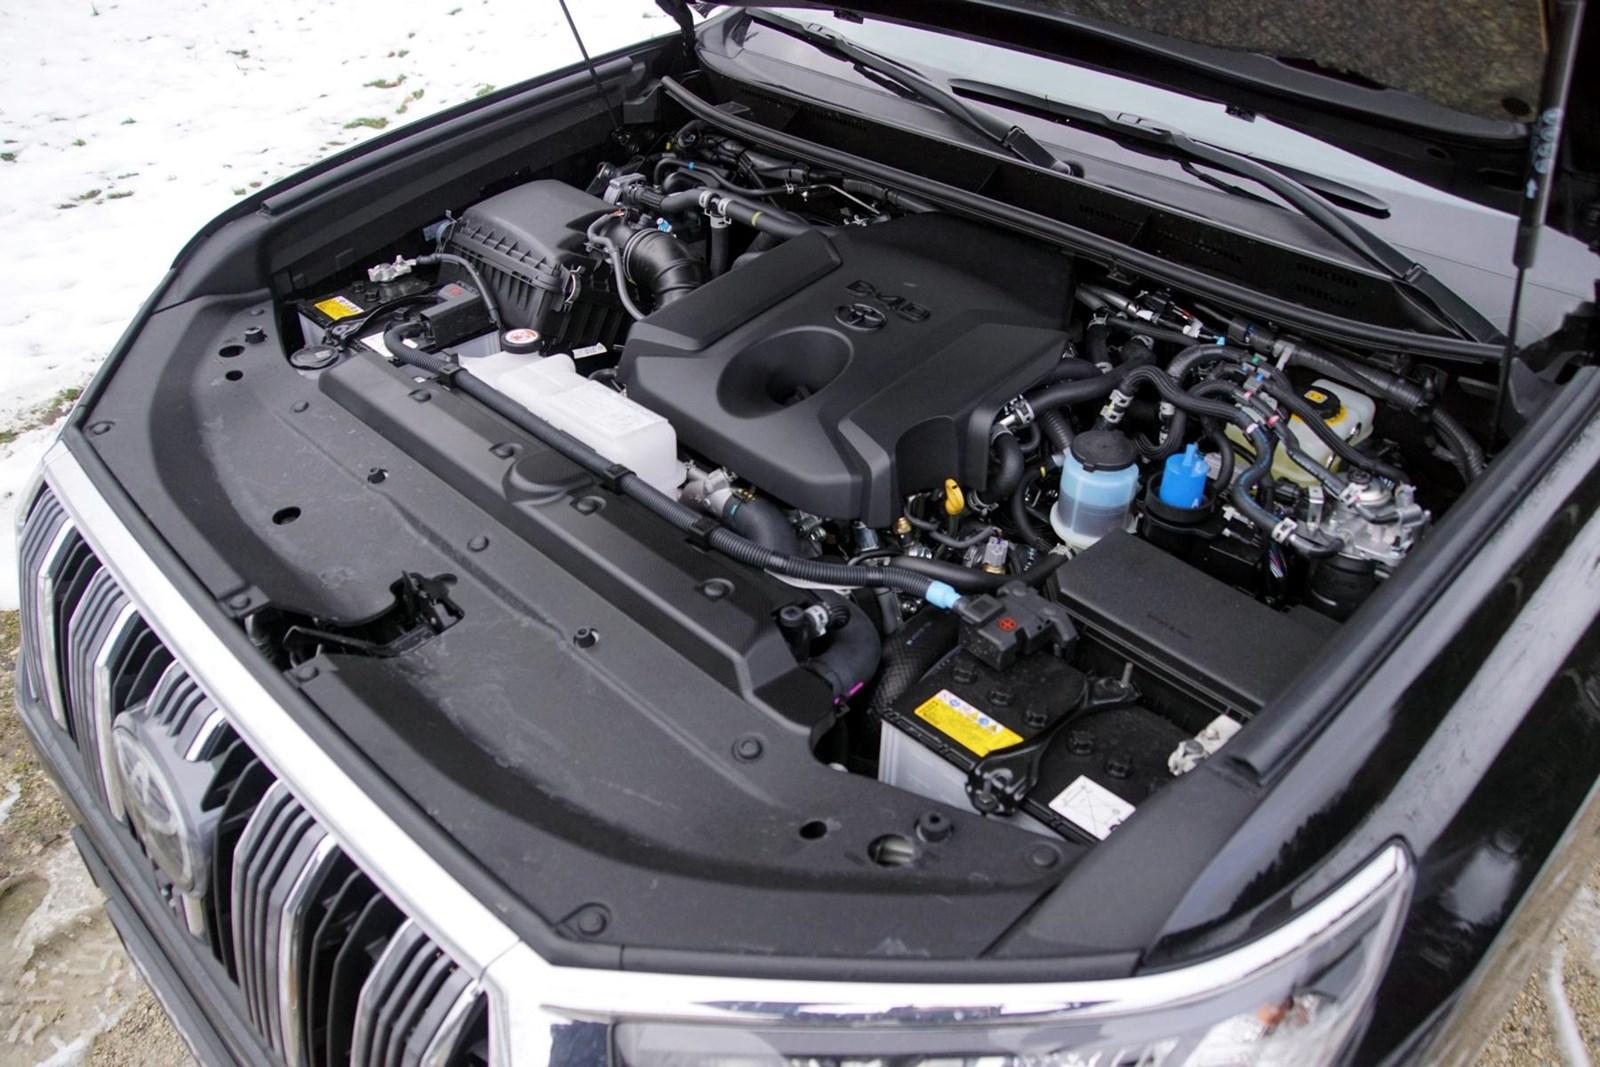 Toyota Land Cruiser Testbericht Gepflegter Abenteurer 2018 20